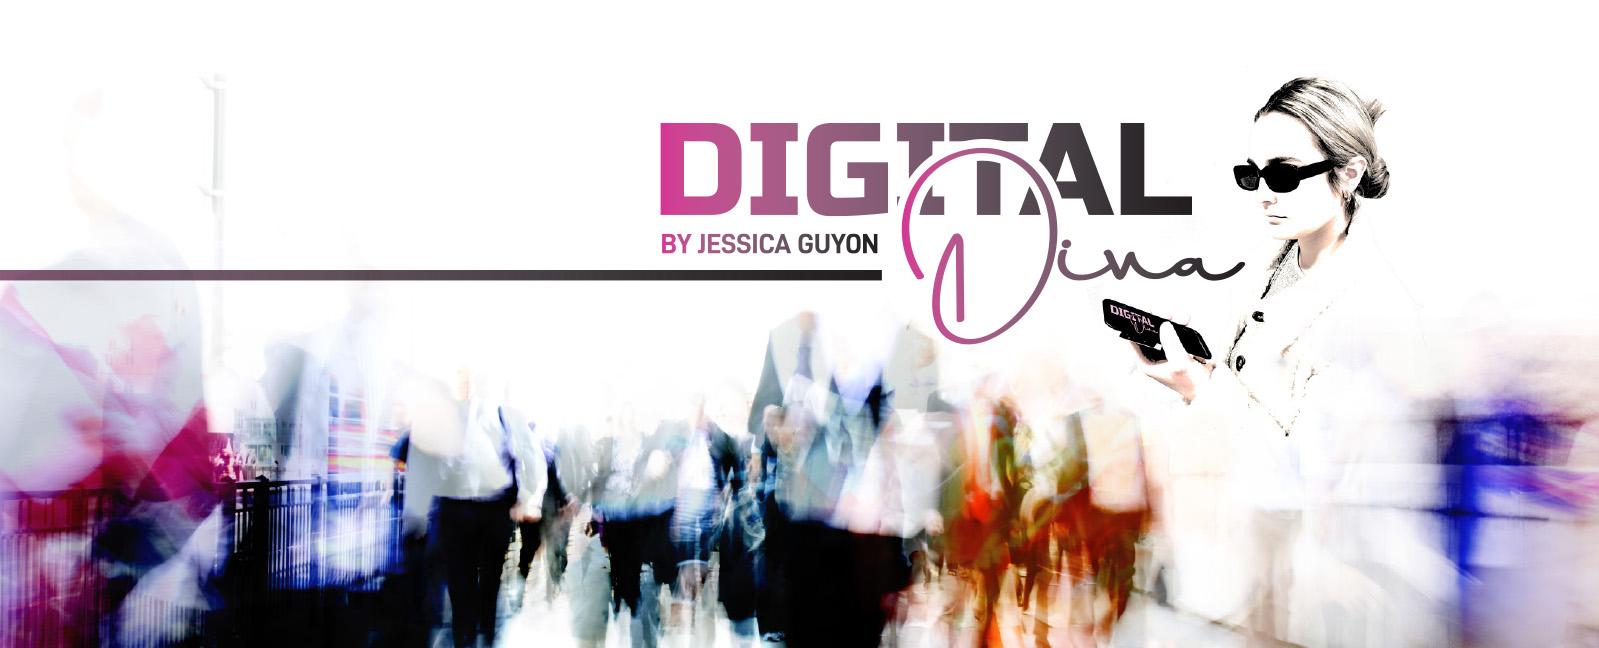 Digital Diva Column by Dealerscope Magazine